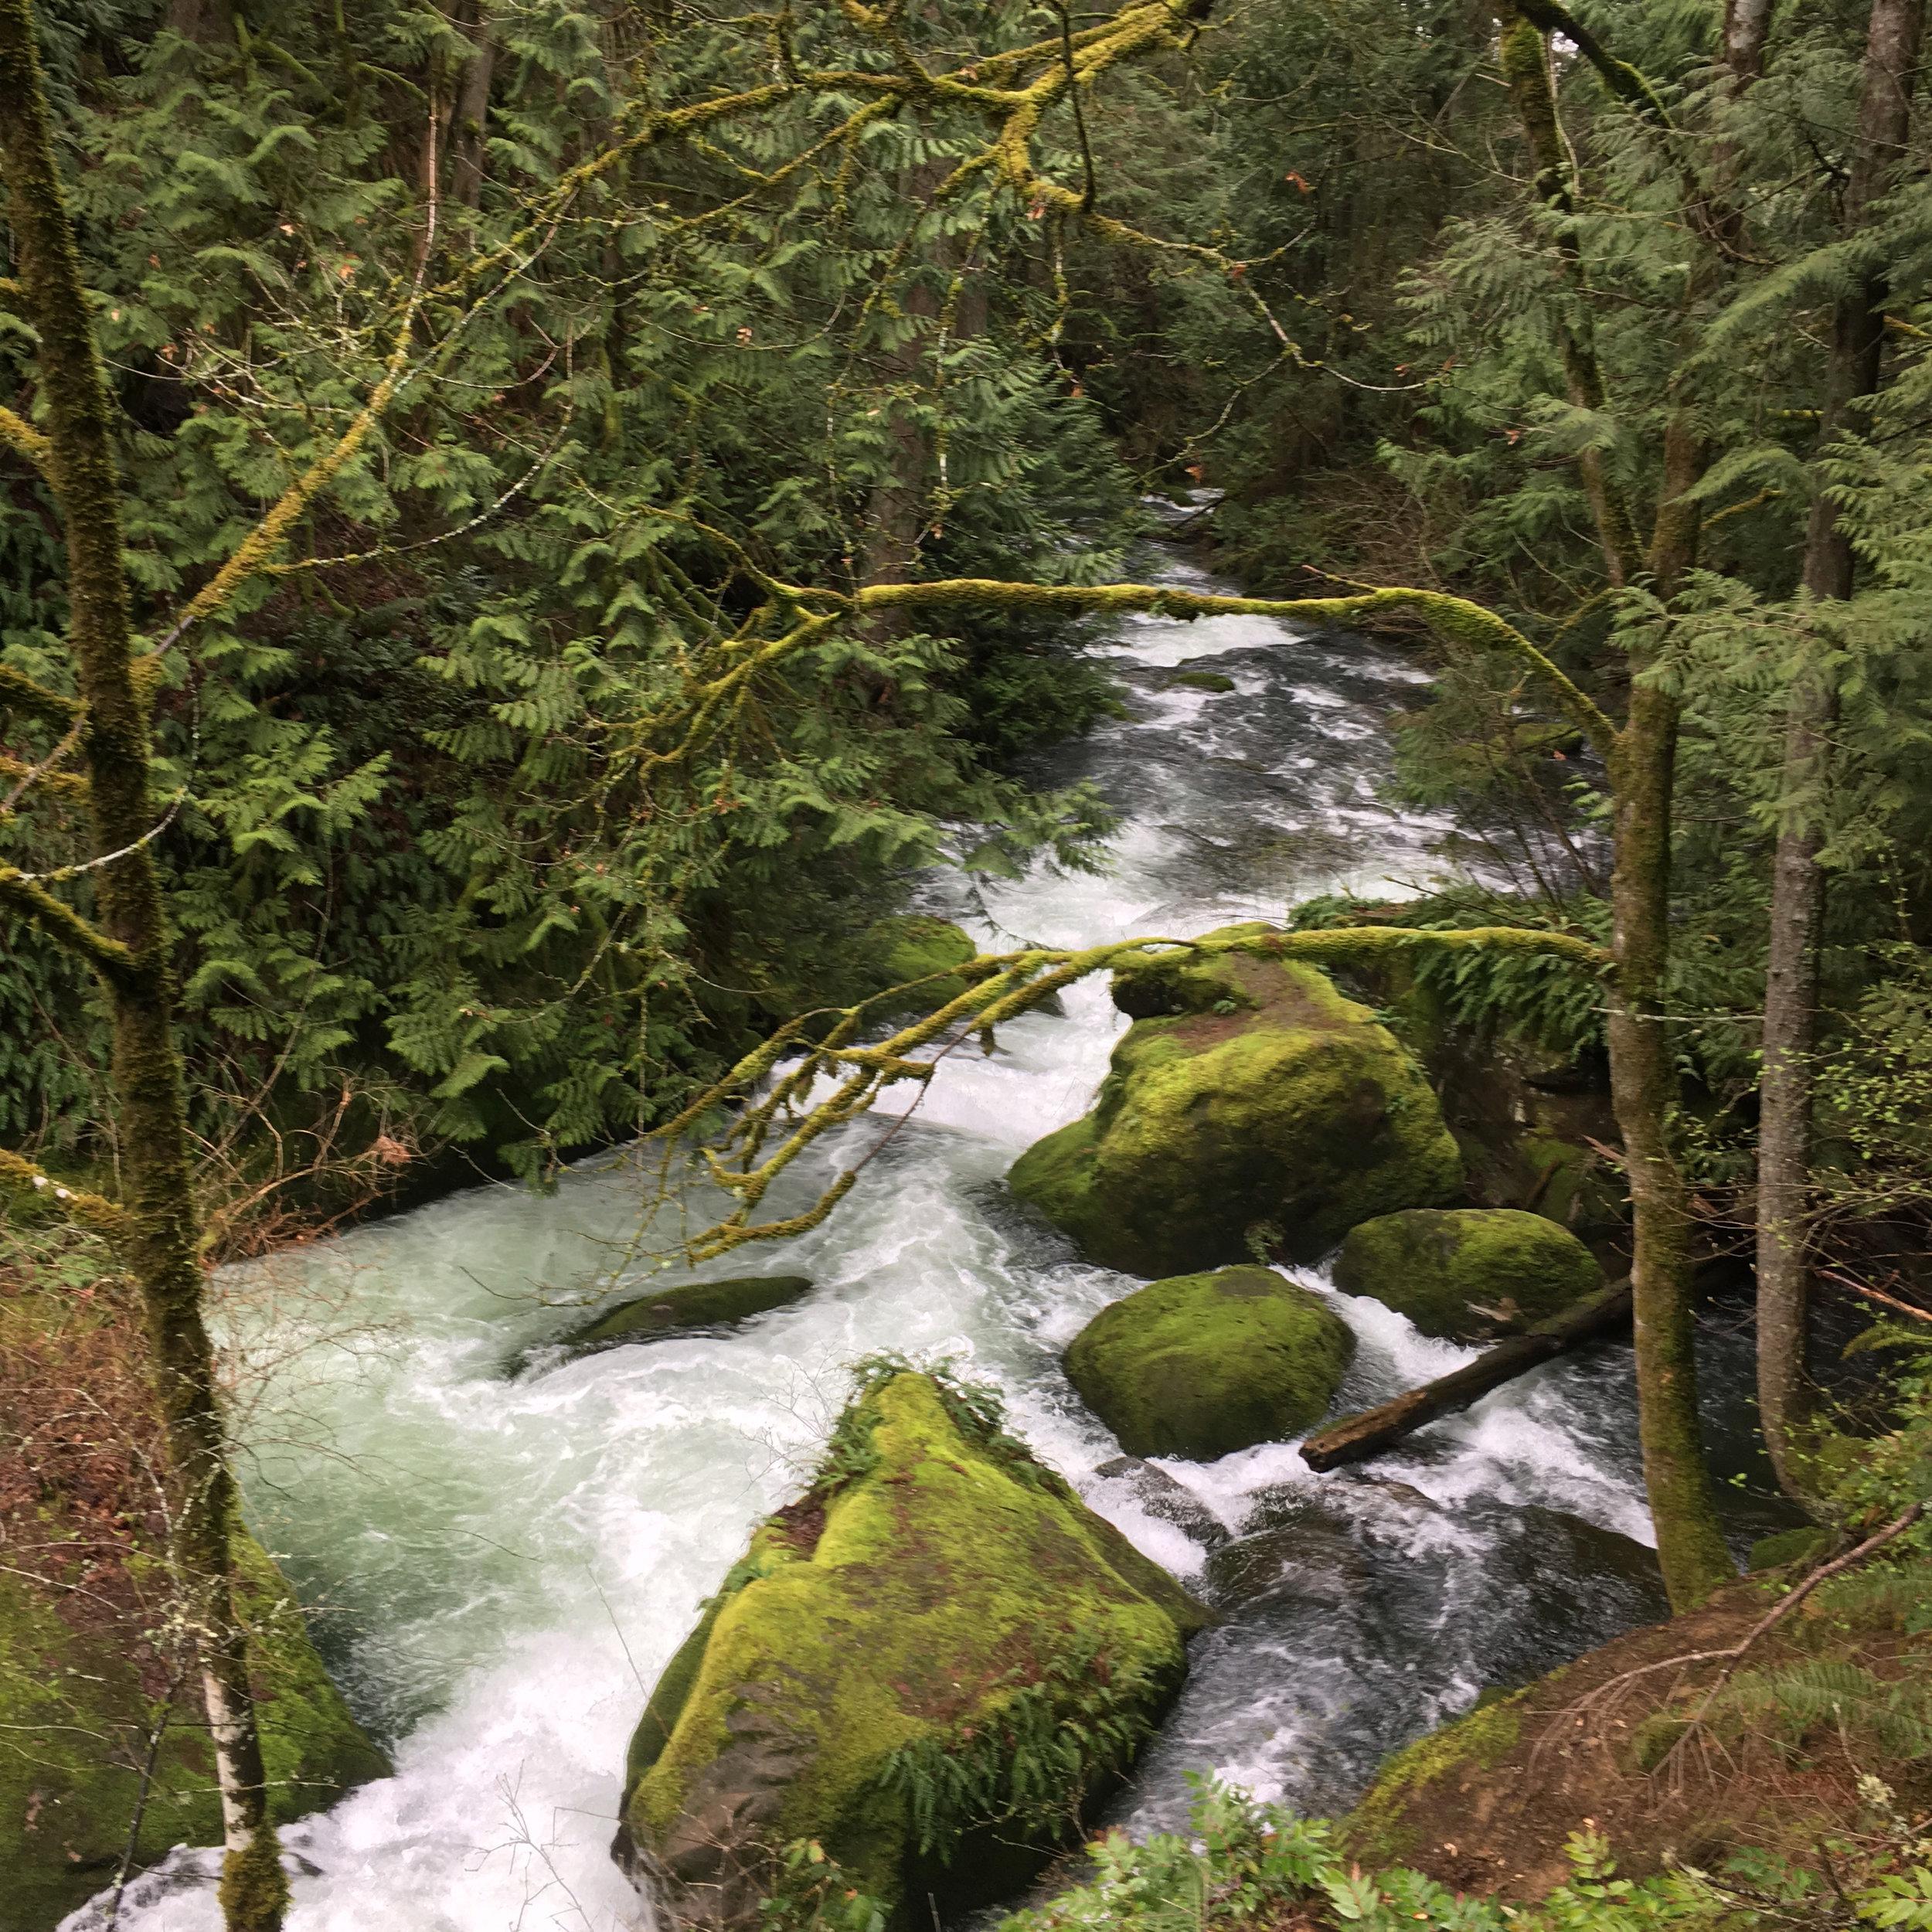 Moss clings to rocks and trees alike in this riparian habitat along Whatcom Creek.